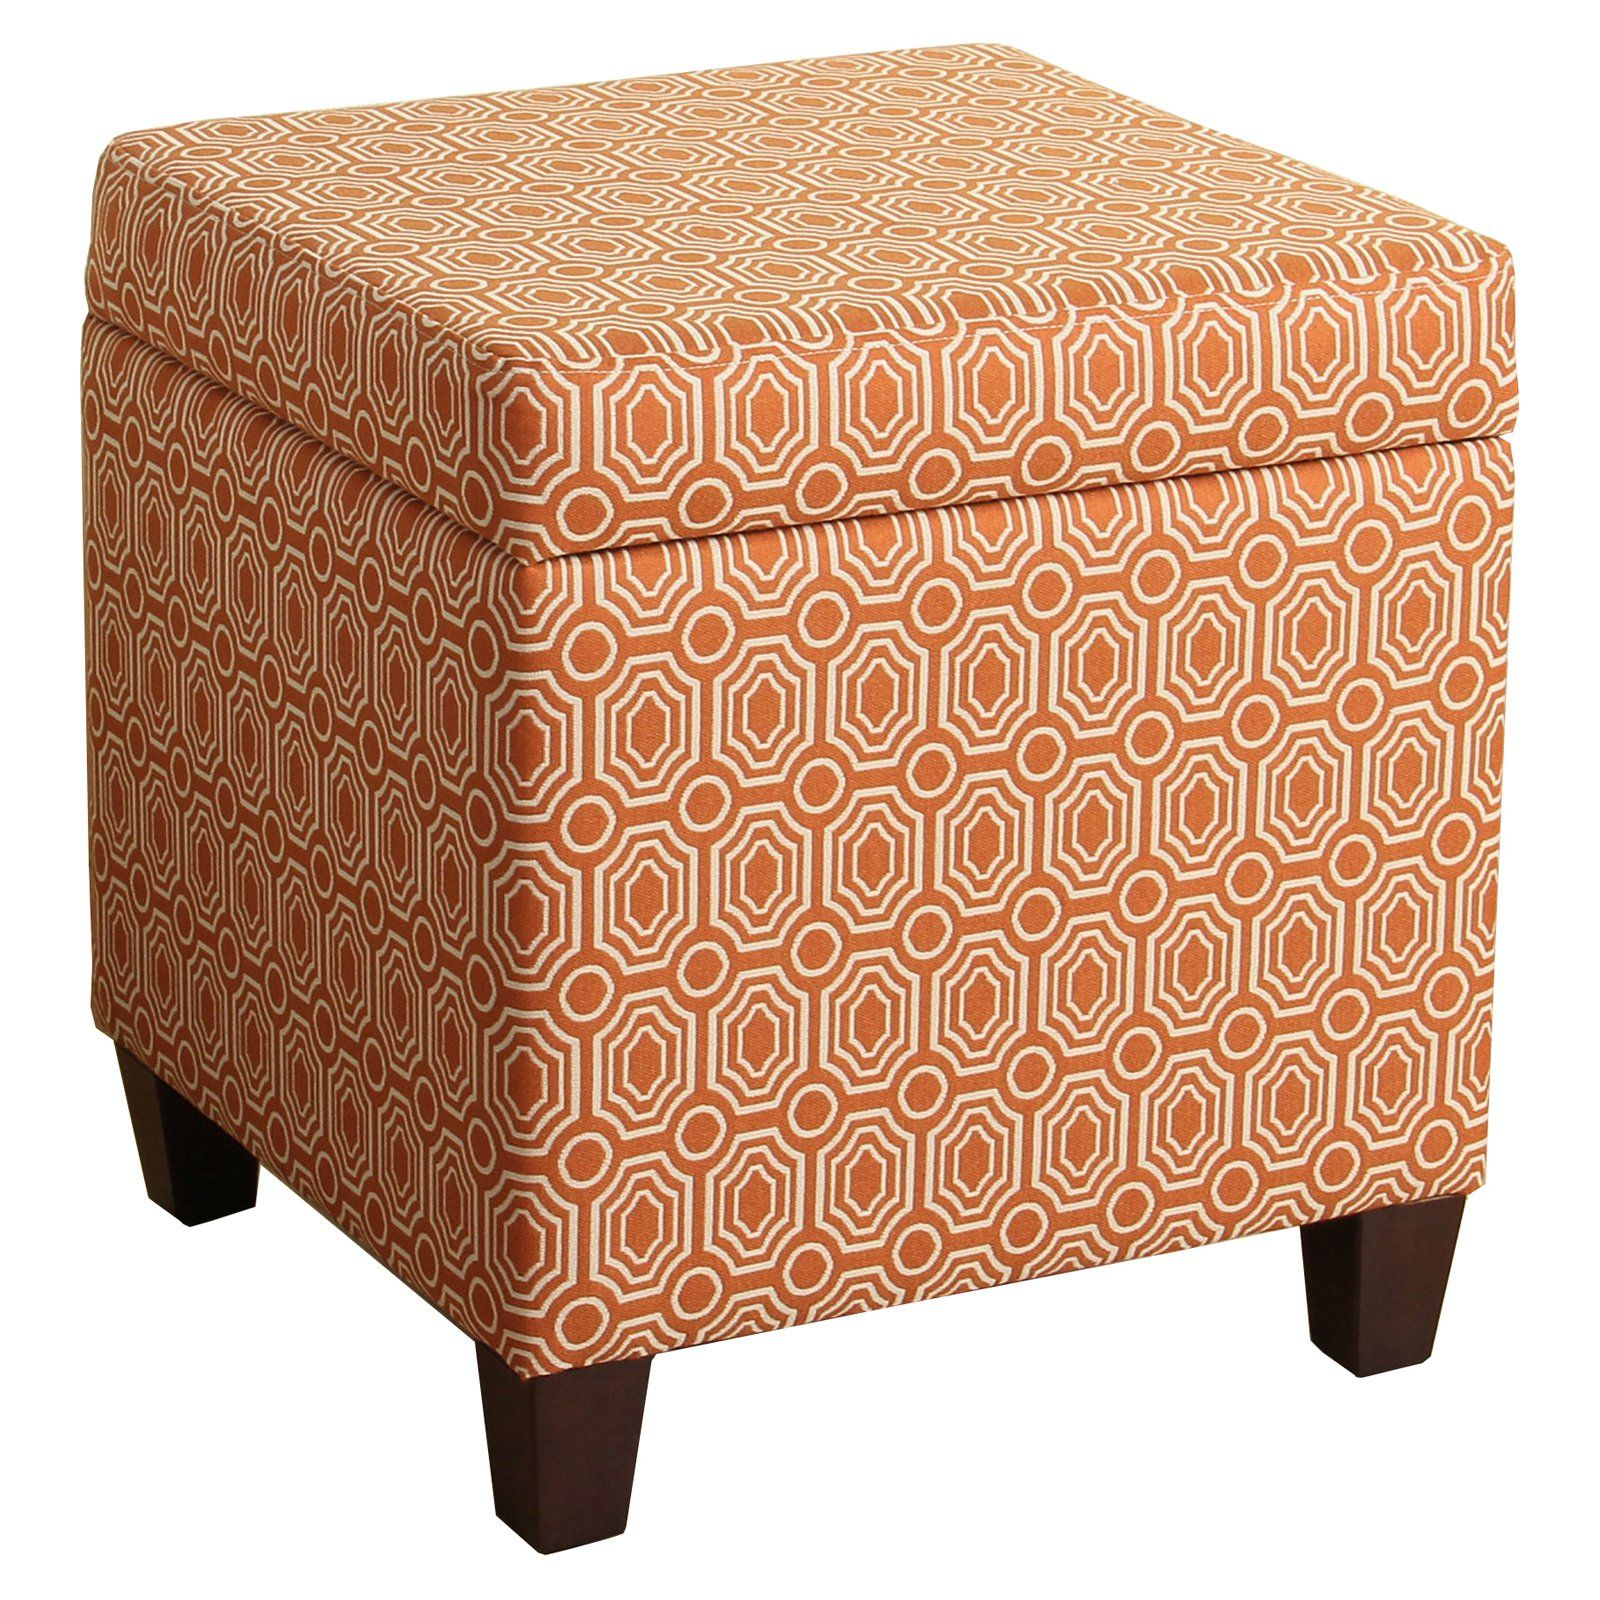 Homepop Storage Cube Ottoman Orange Storage Cube Ottoman Cube